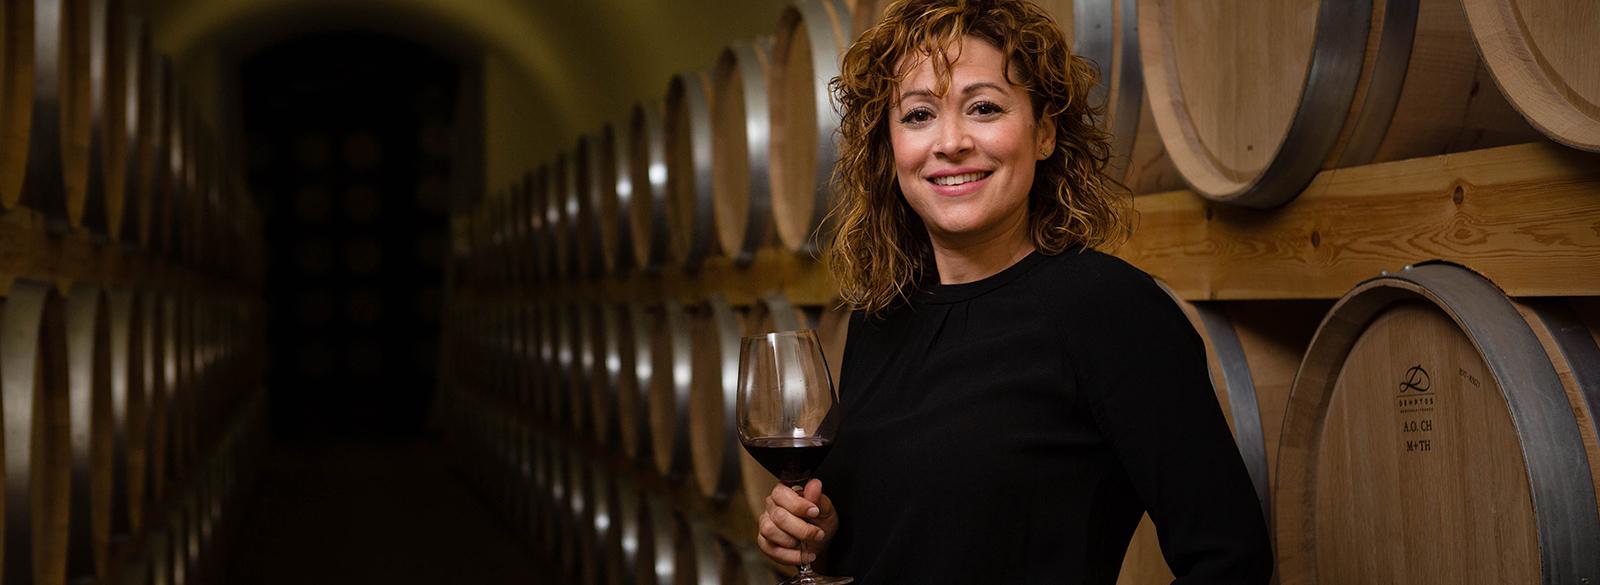 Entrevista a Almudena Alberca